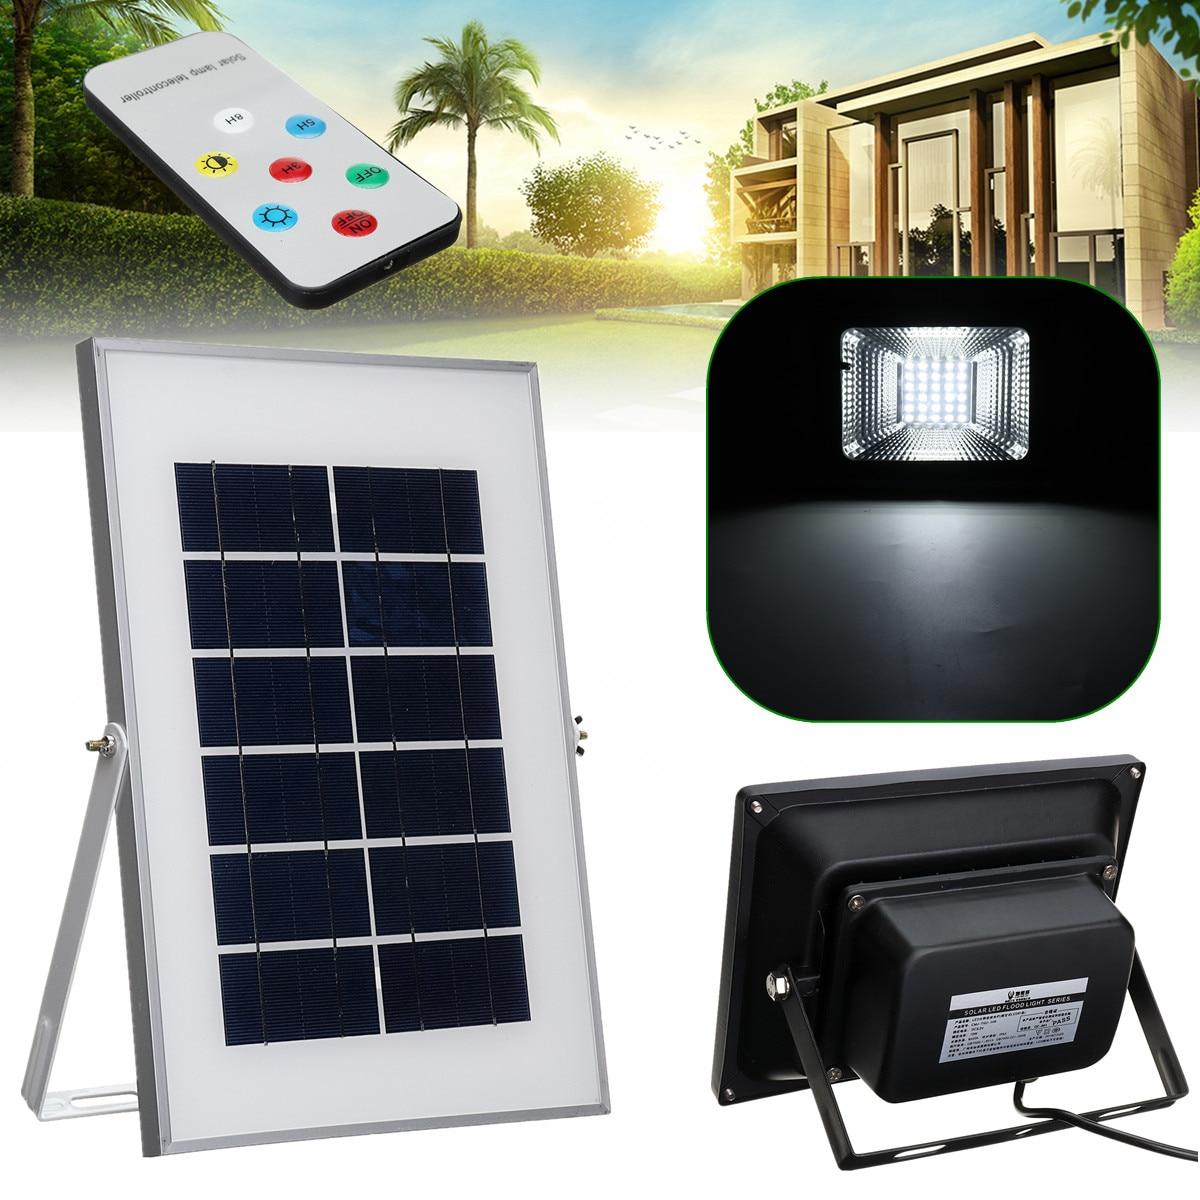 Remote Control Outdoor Garden Lawn Lighting Lamp 30 LED Solar Power Flood Light Reusable & Super Bright Intelligent Sunlight цена 2017